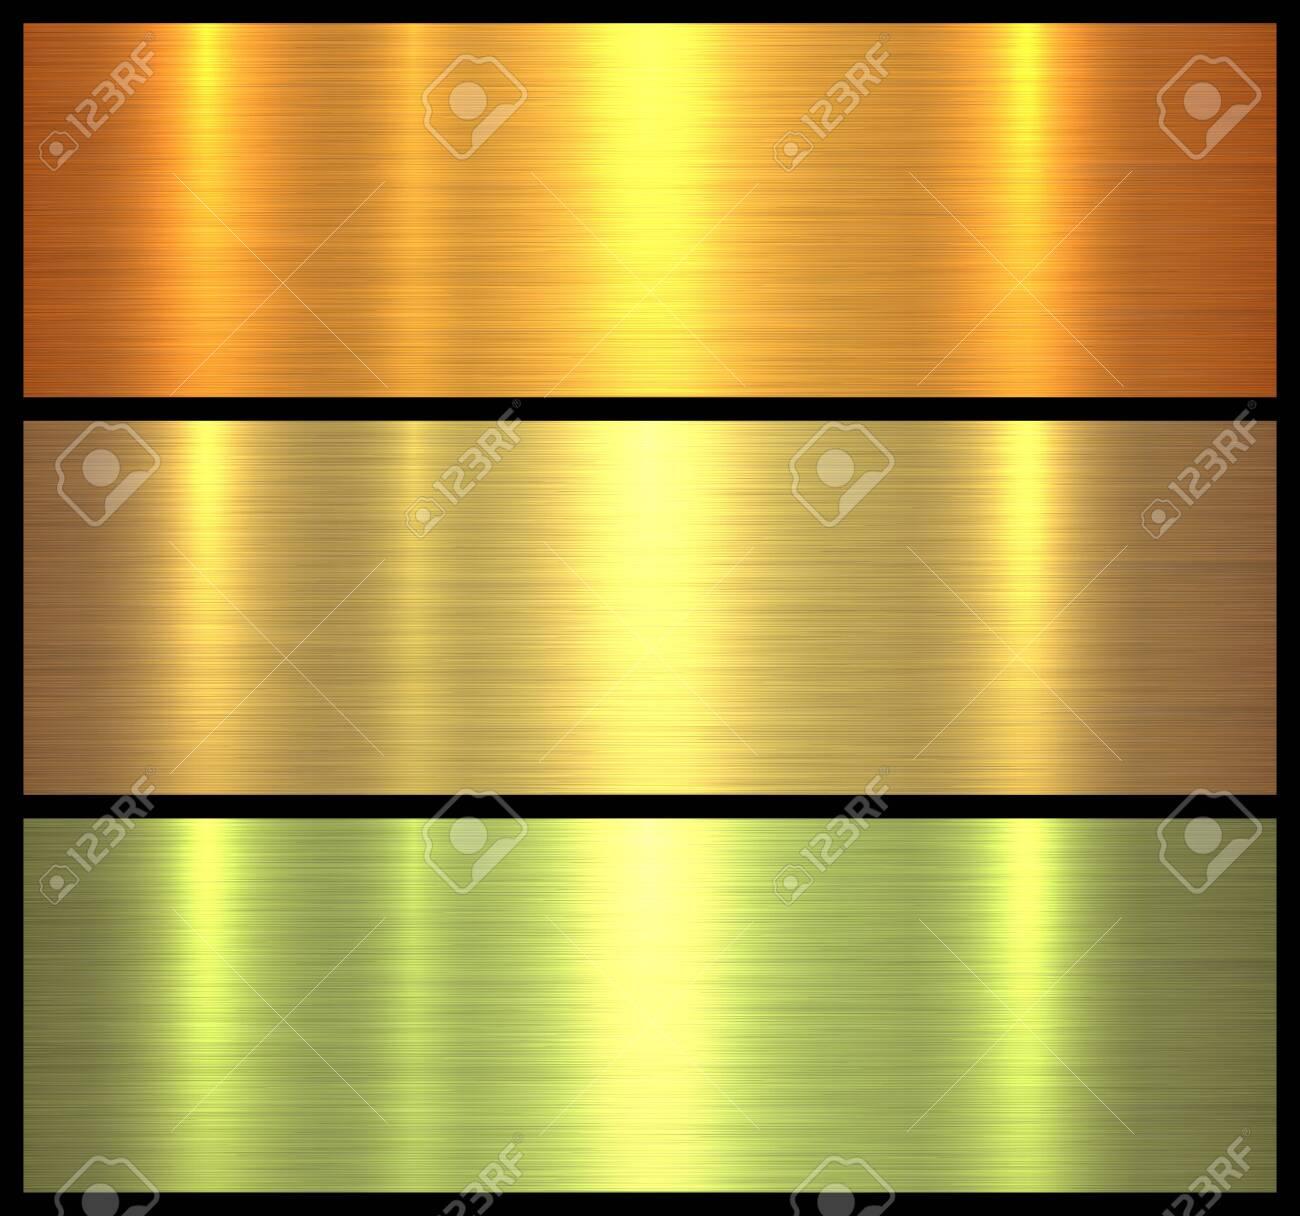 Metal textures gold brushed metallic background, vector illustration. - 120175637